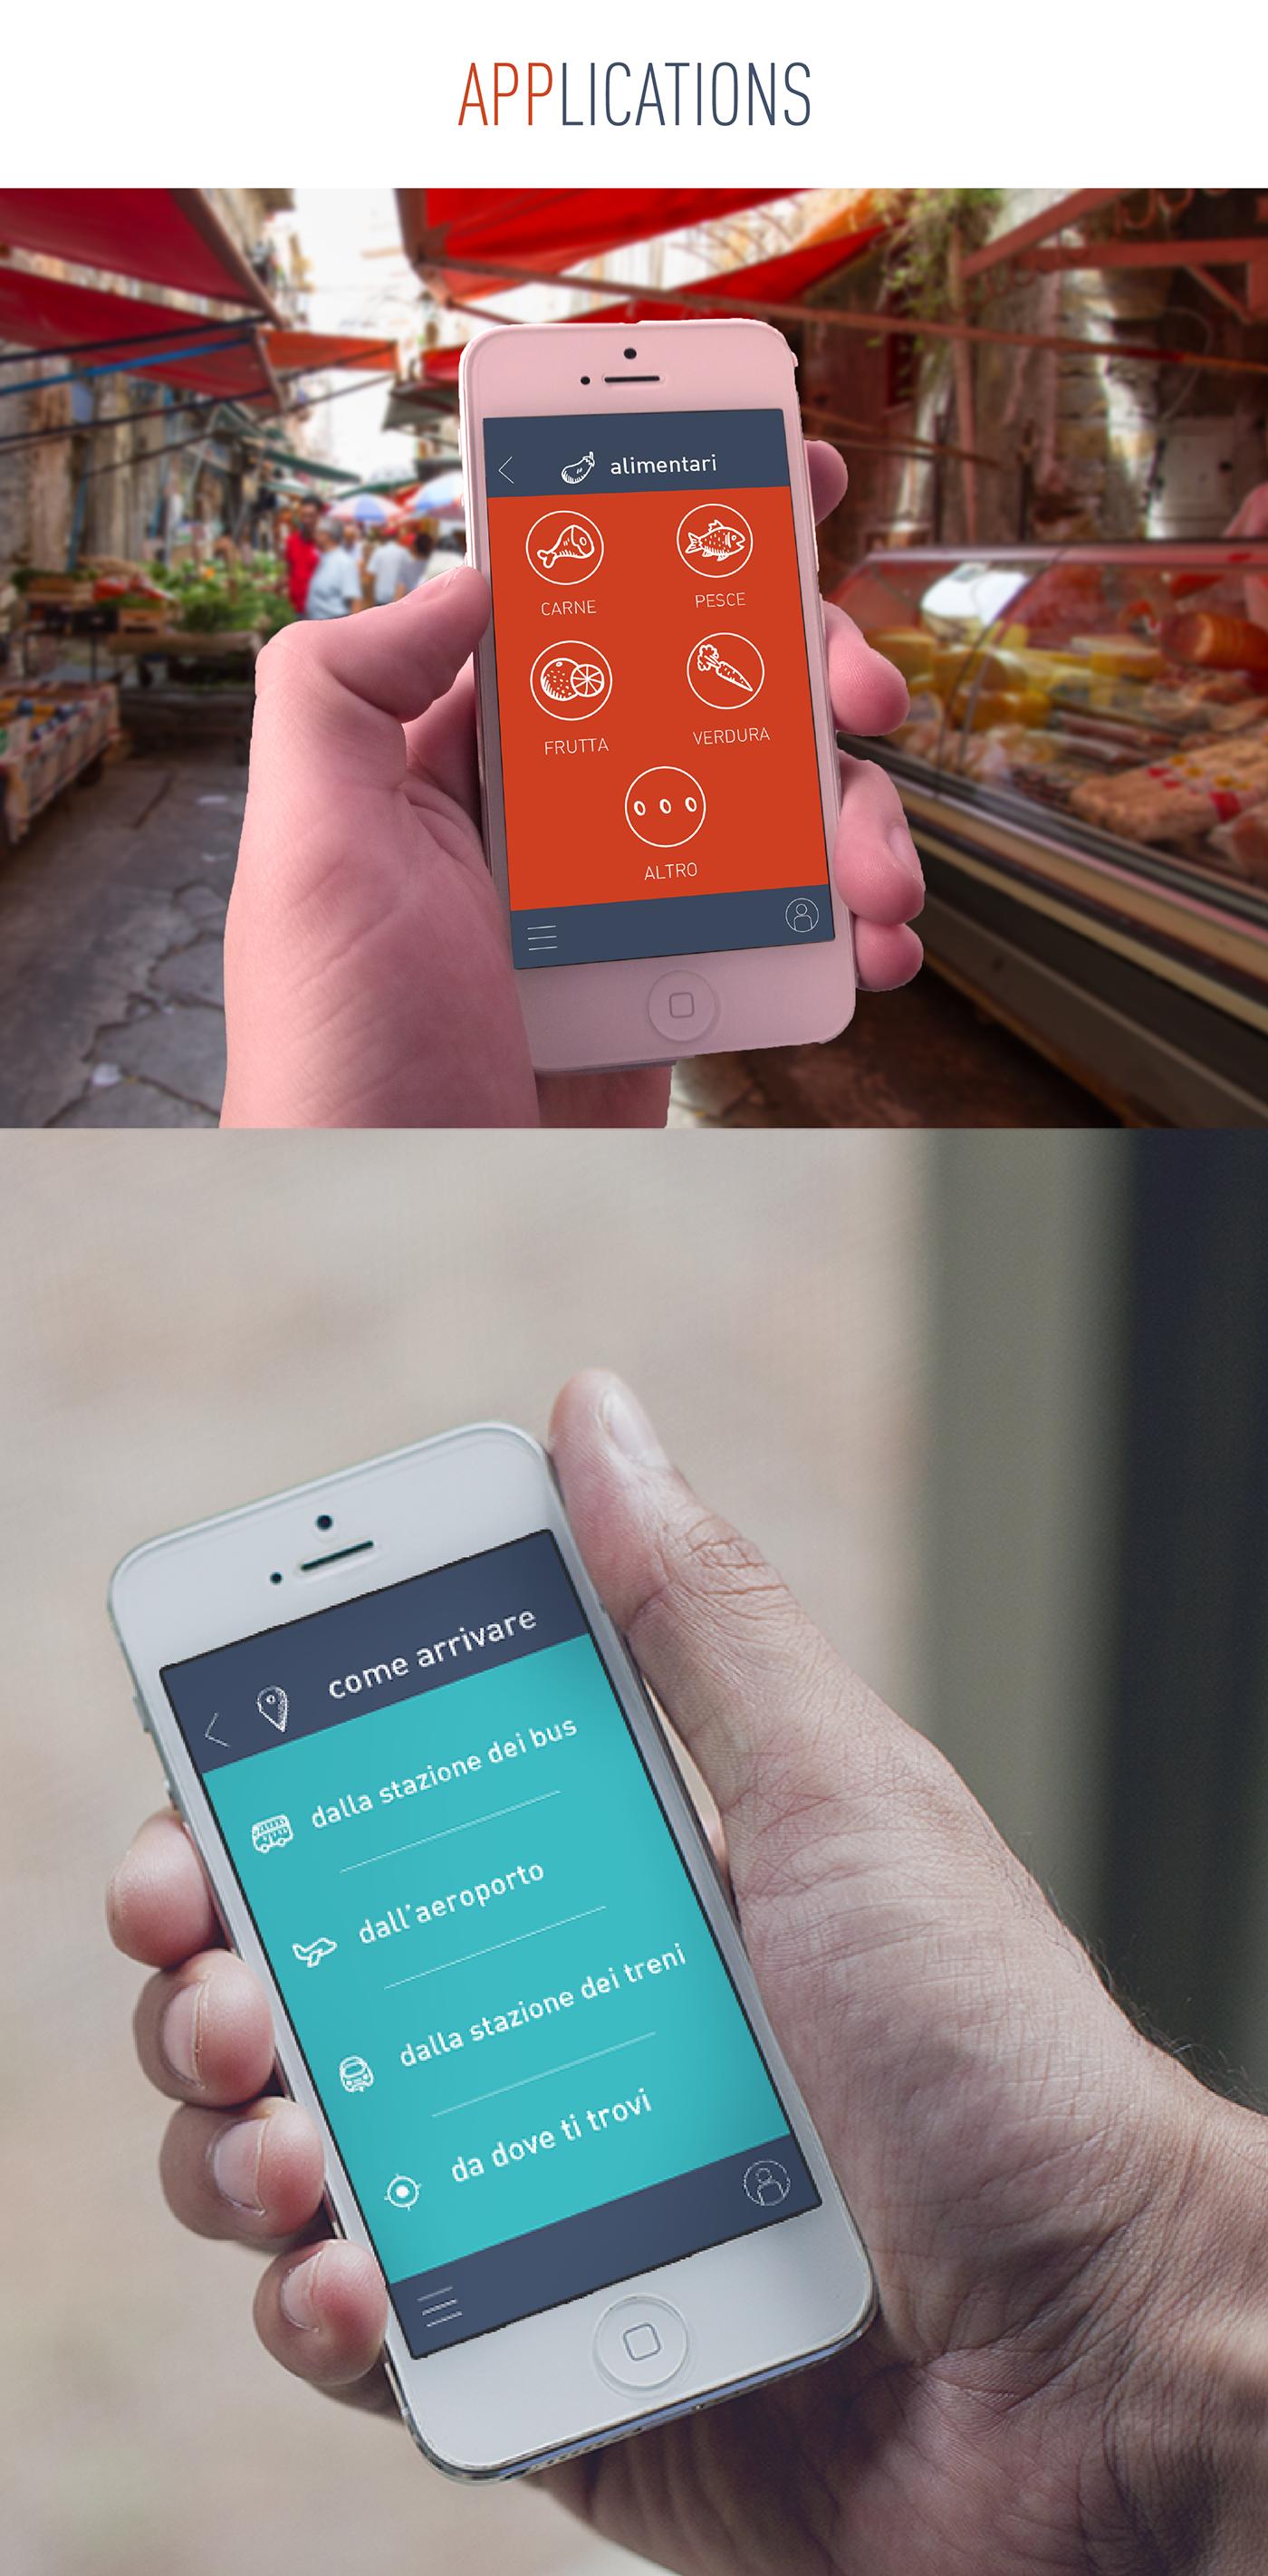 Food ,market,sicily,Palermo,interaction,design,phone,app,ui ux,mobile,discover,trip,journey,Travel,motion